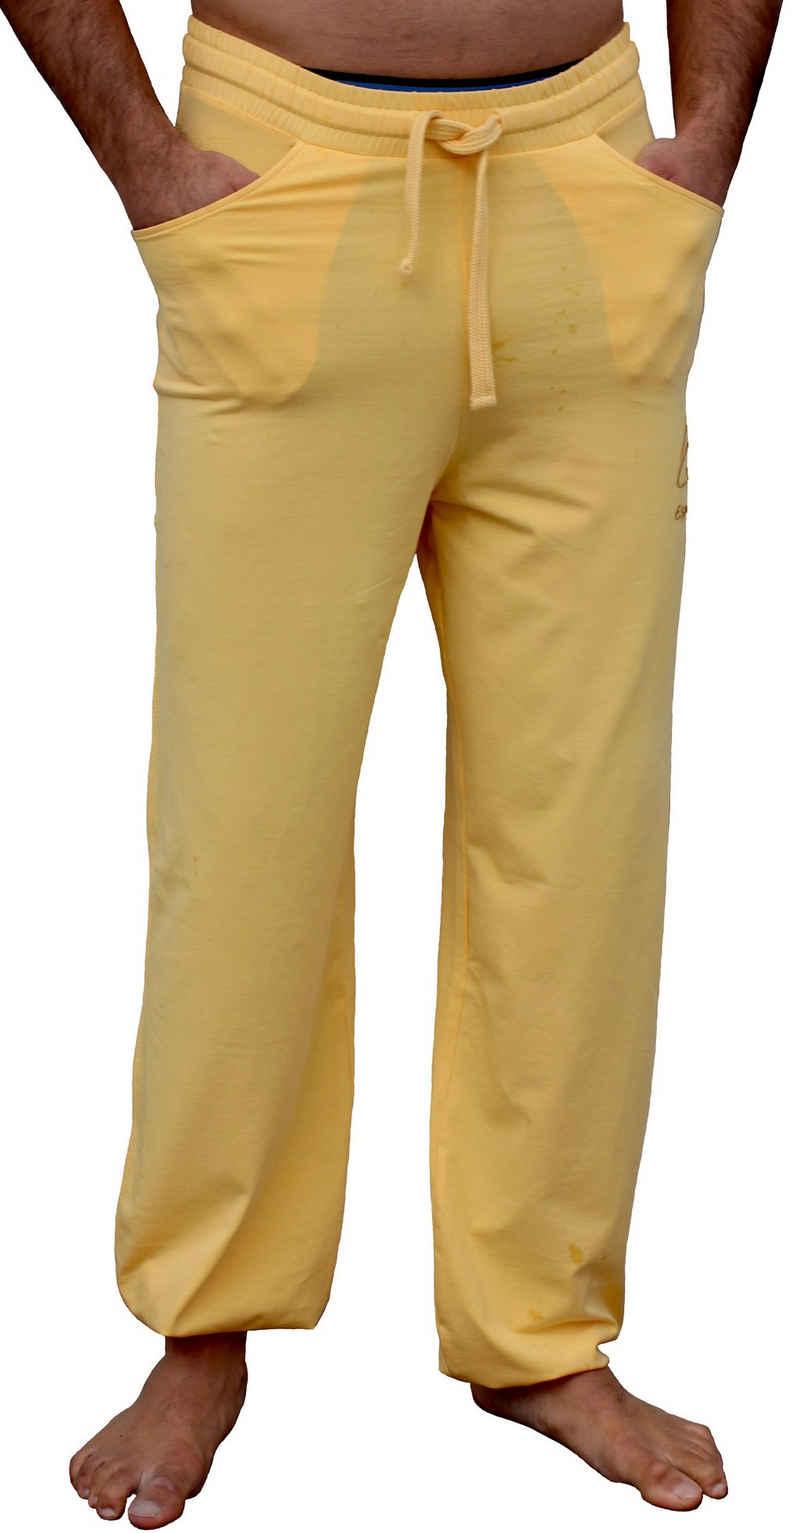 ESPARTO Yogahose »Yoga- und Sporthose Sitaara« (mit Kordel im Bund) Bindegürtel / -kordel